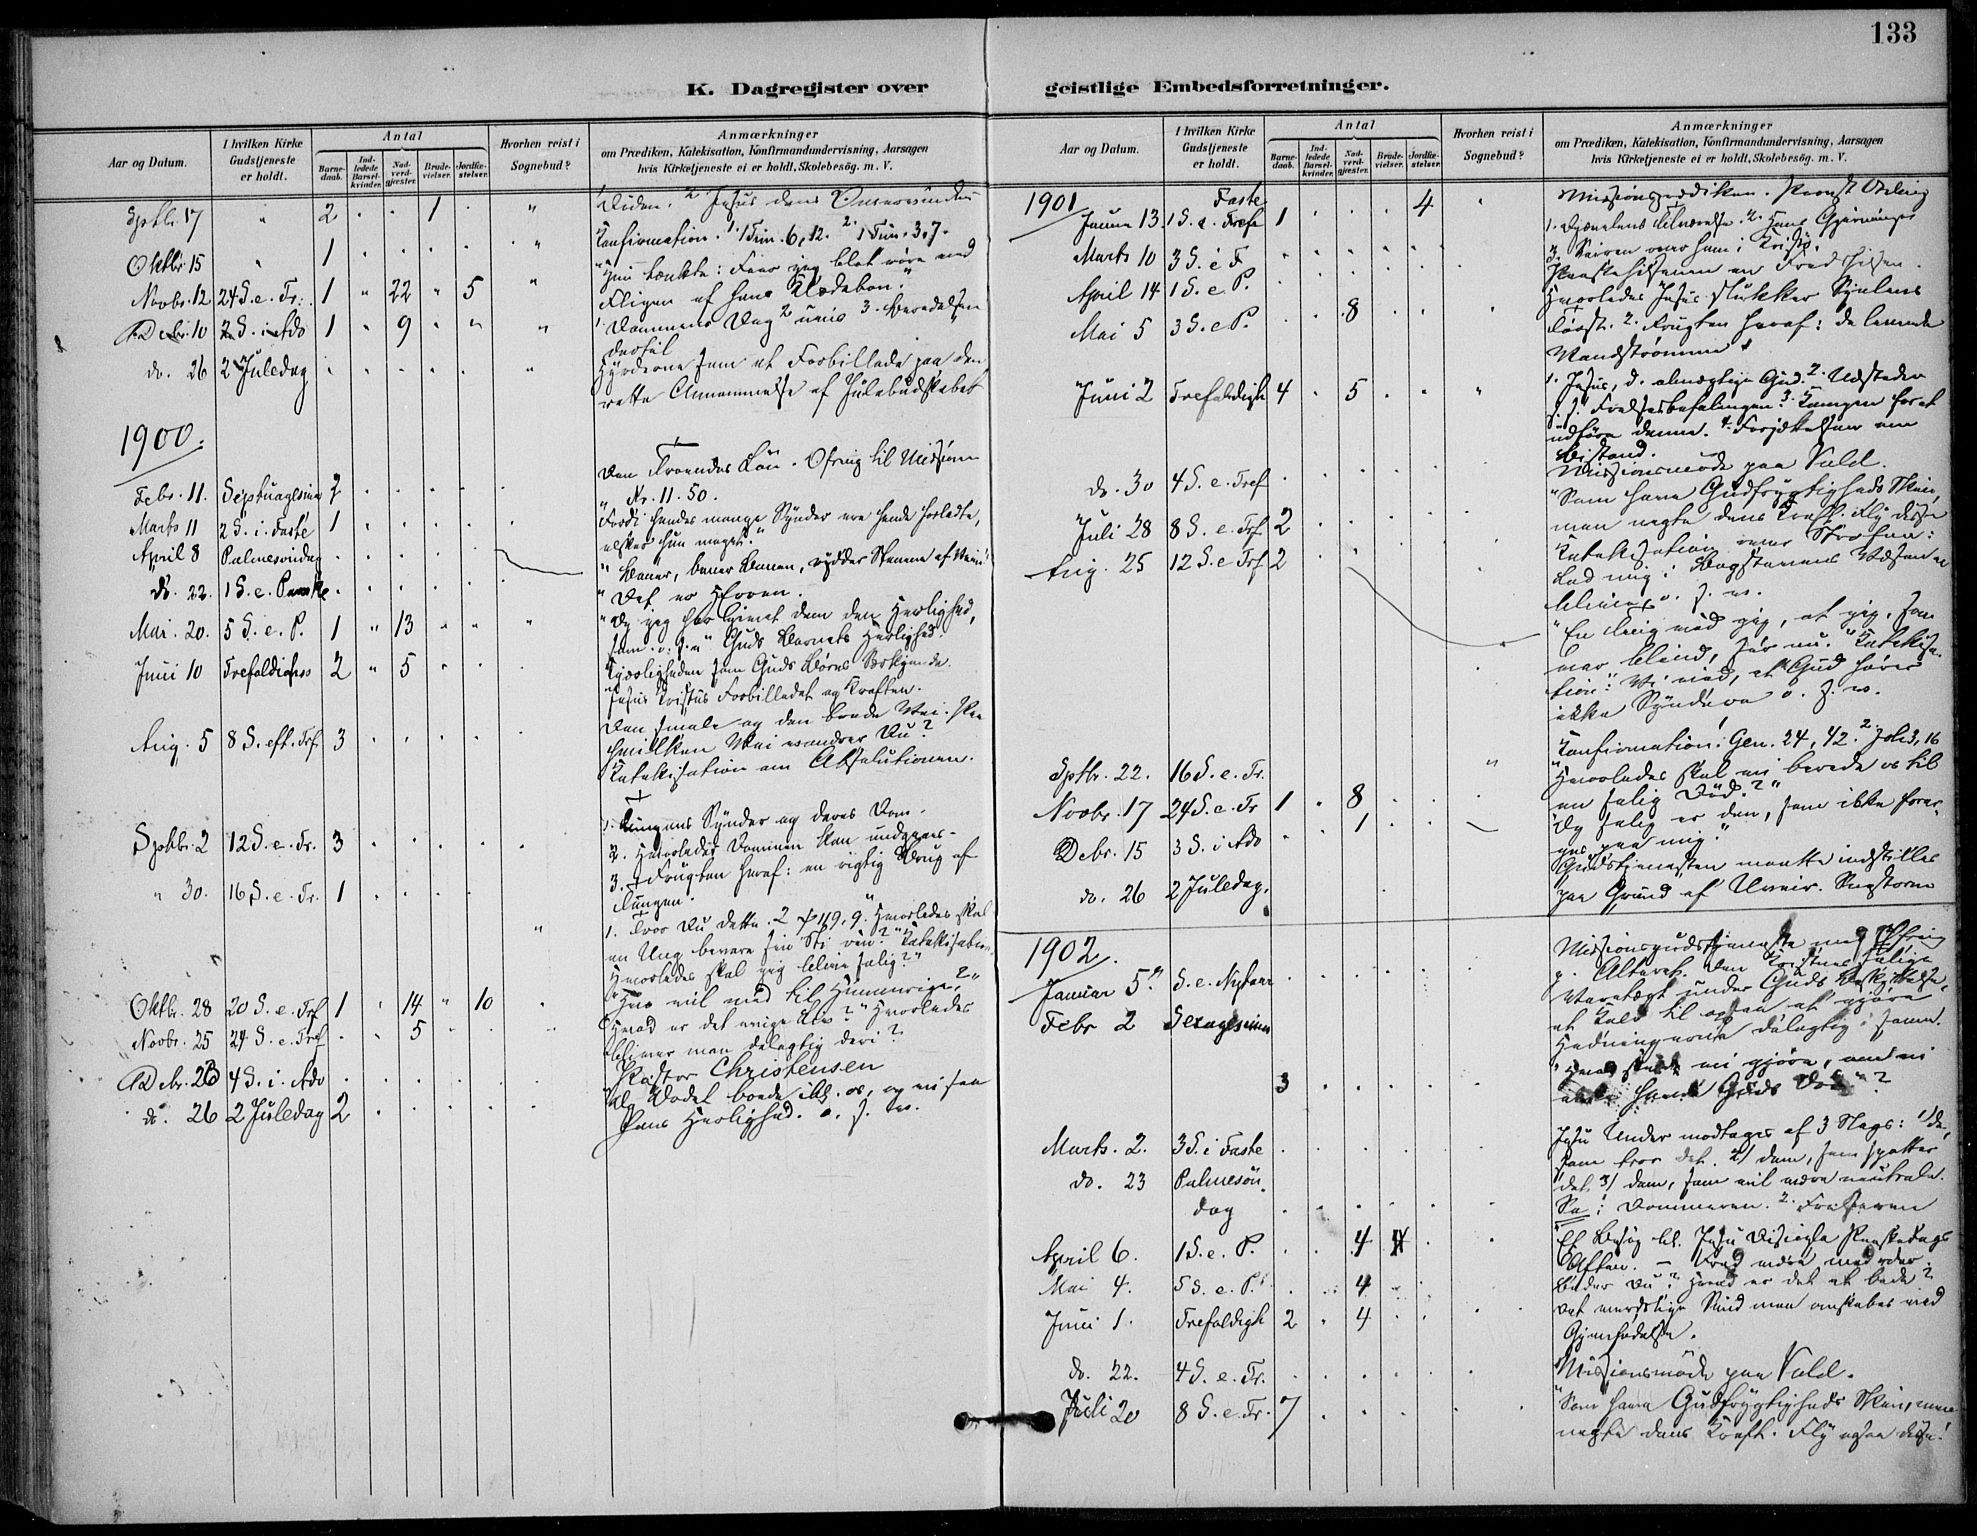 SAKO, Solum kirkebøker, F/Fc/L0002: Ministerialbok nr. III 2, 1892-1906, s. 133